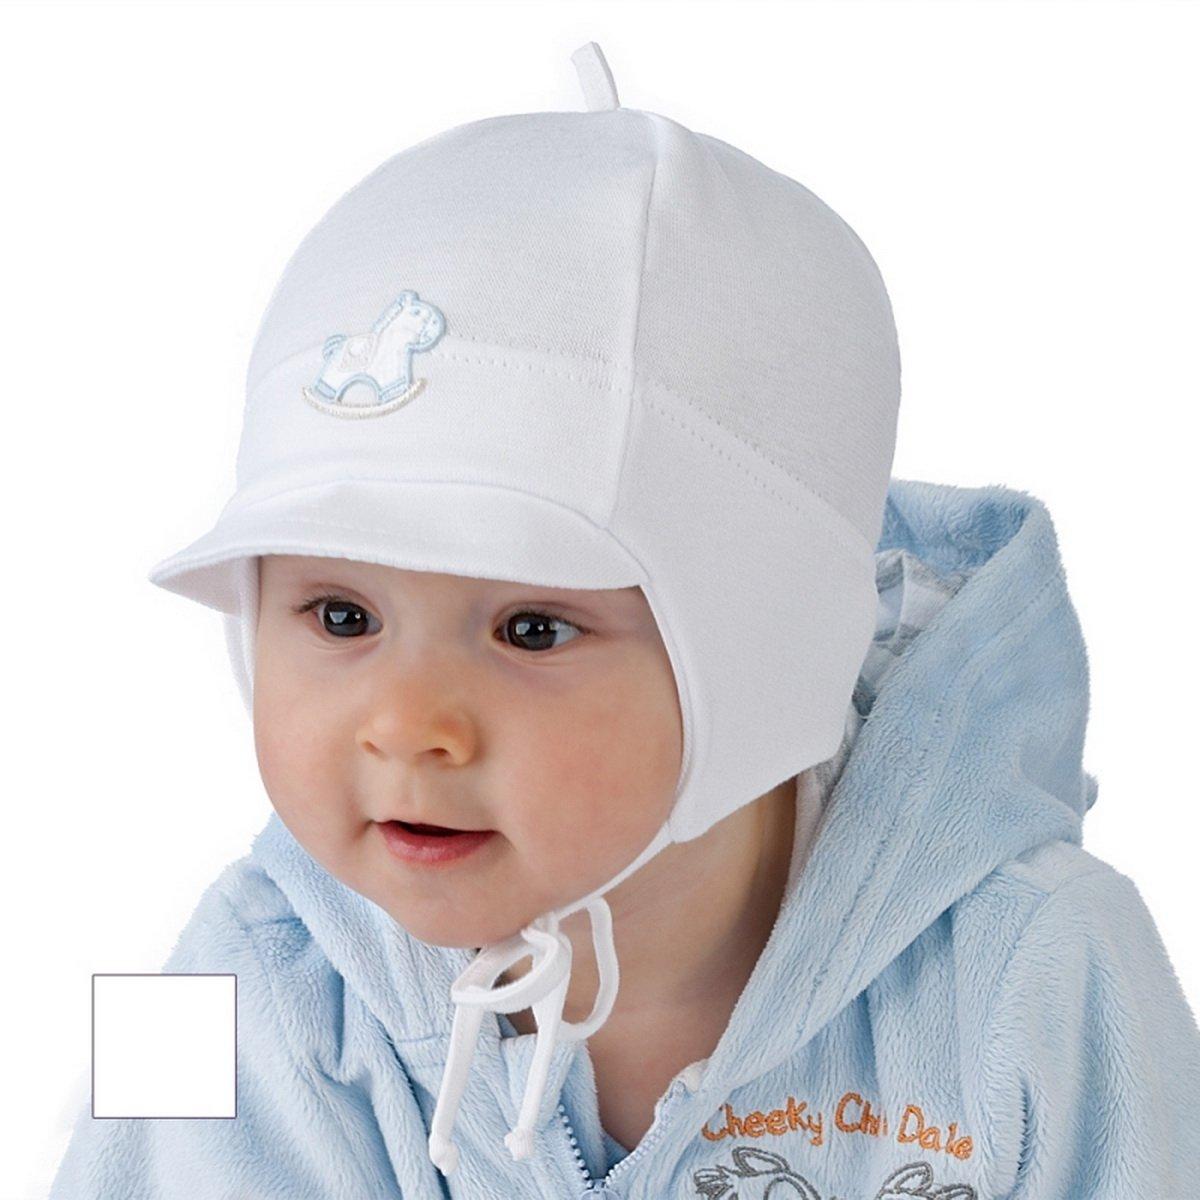 New Baby Boy Hat Boys Spring Autumn Peak Cap Christening Baptism Hat 0 -12 mths (9-12 months 46cm, White) For Kids